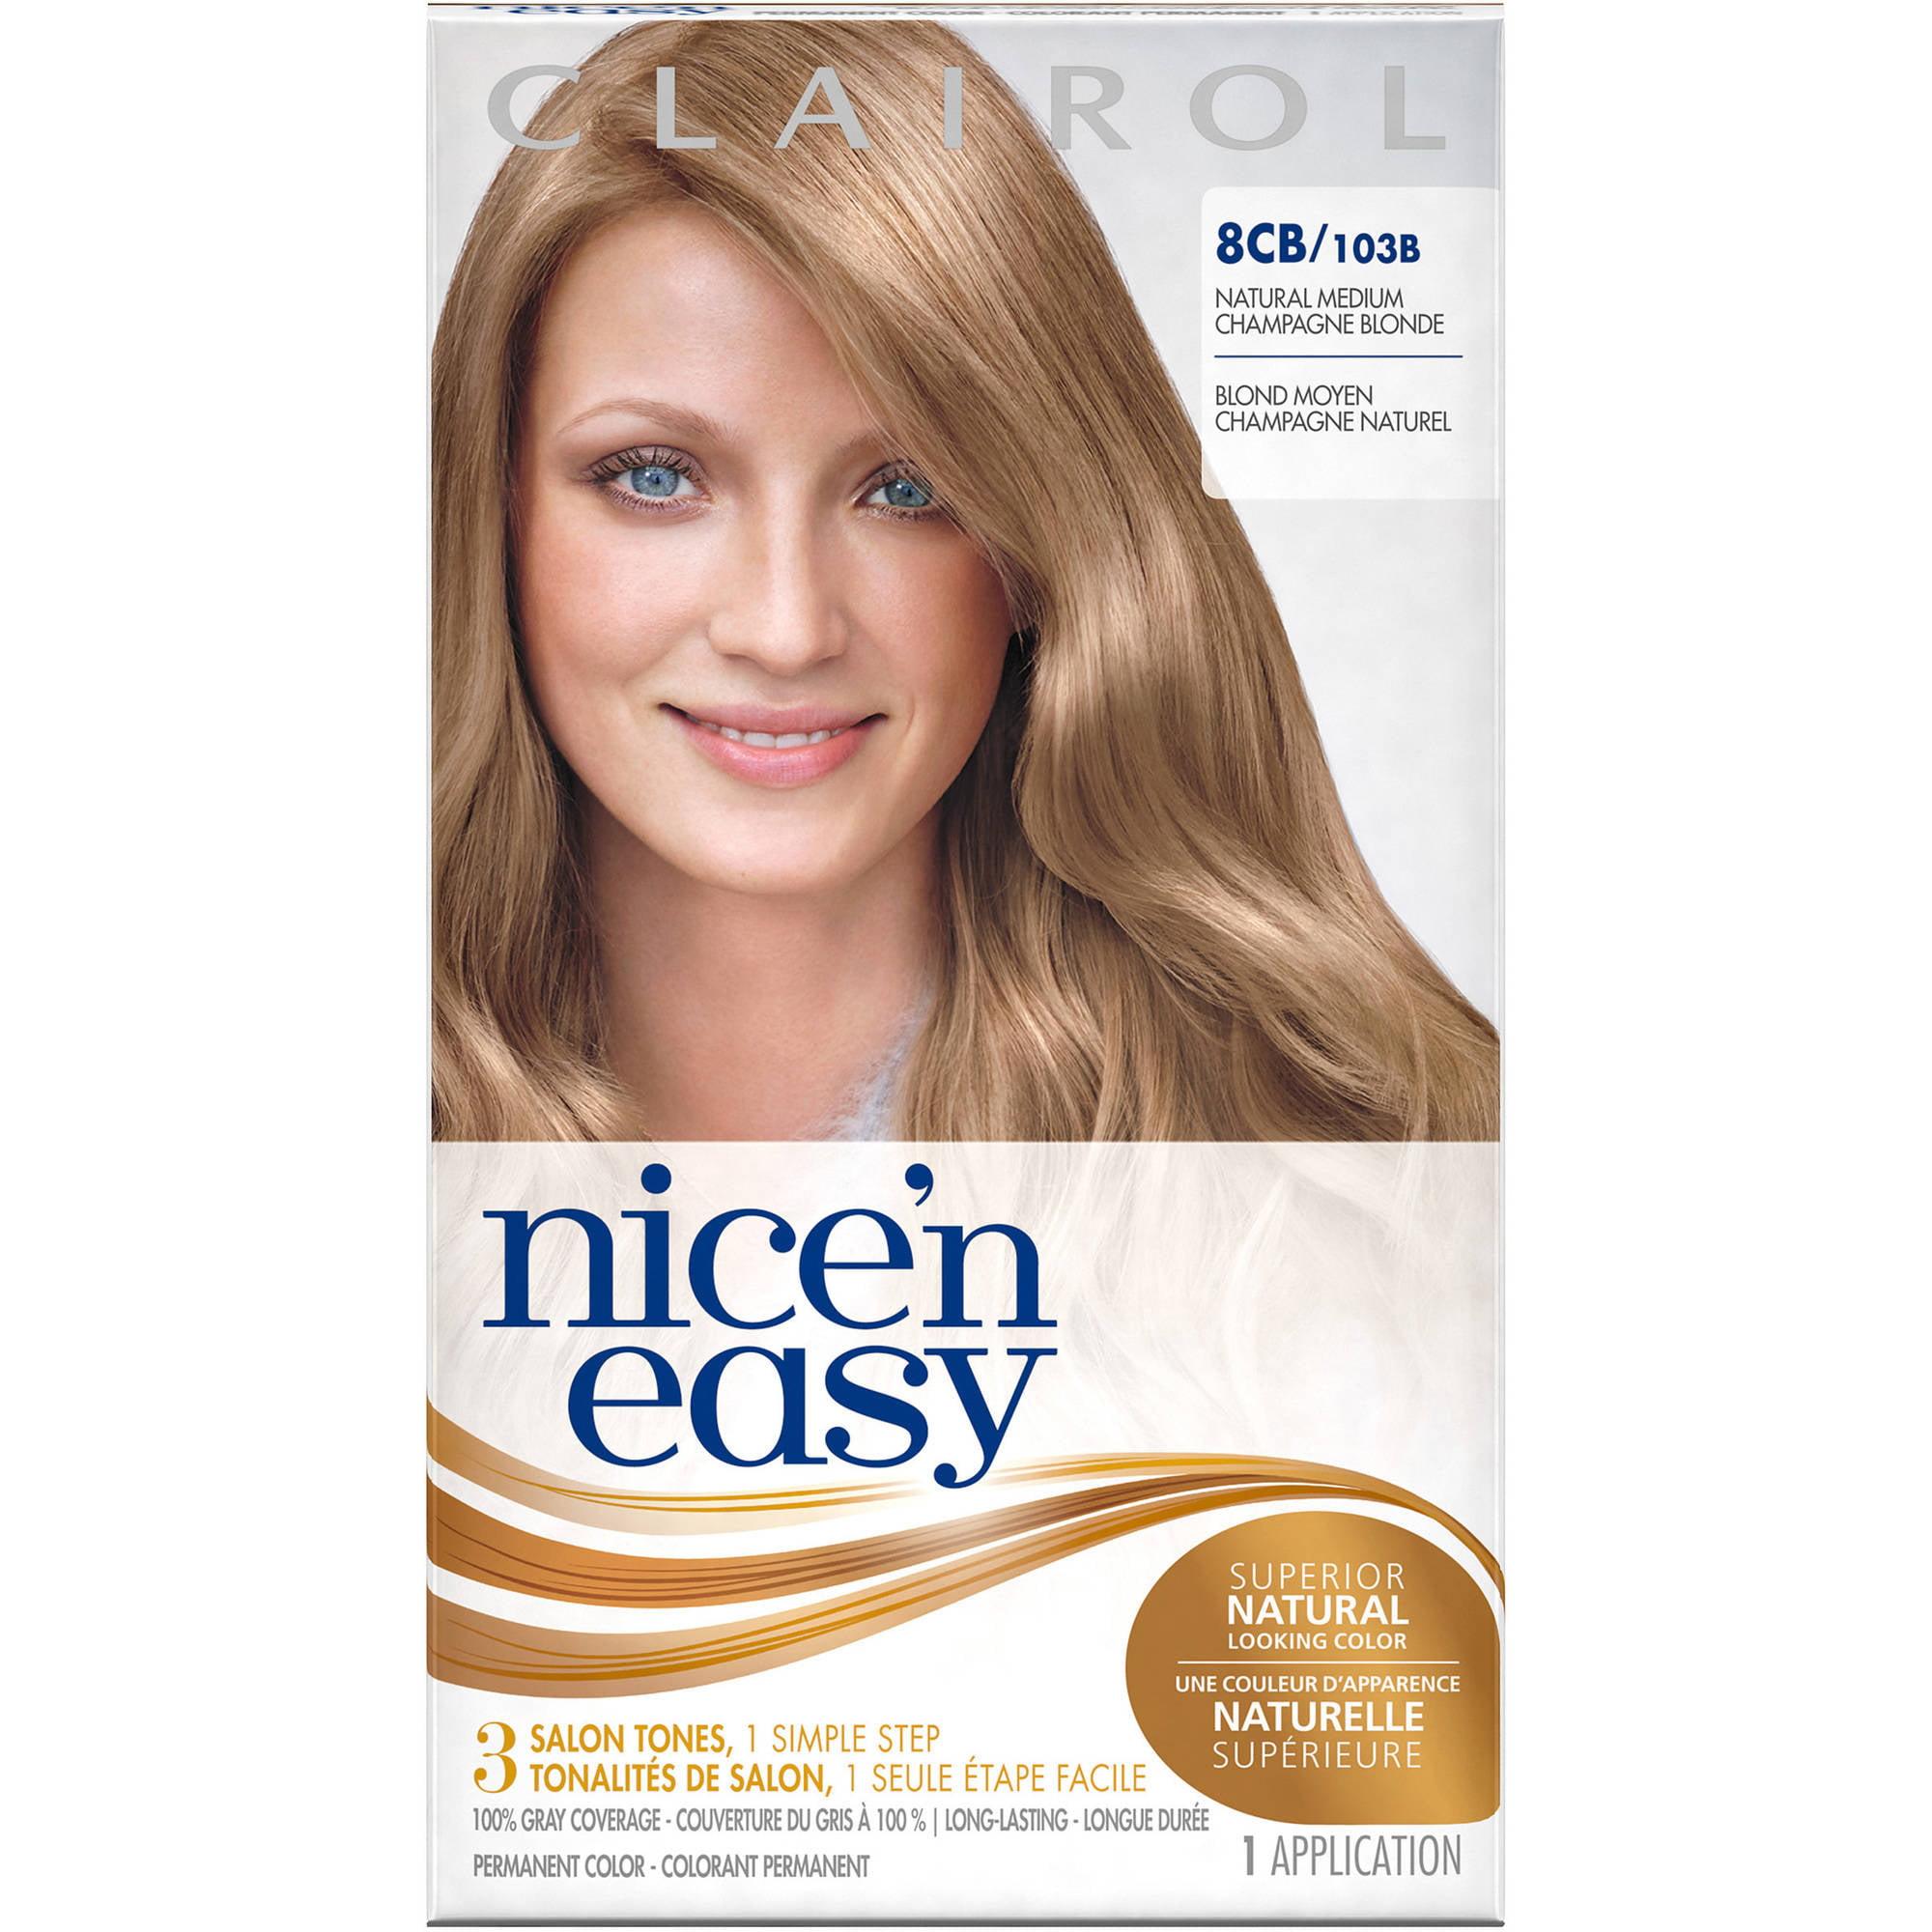 Clairol Nice N Easy Permanent Hair Color Kit 8cb Natural